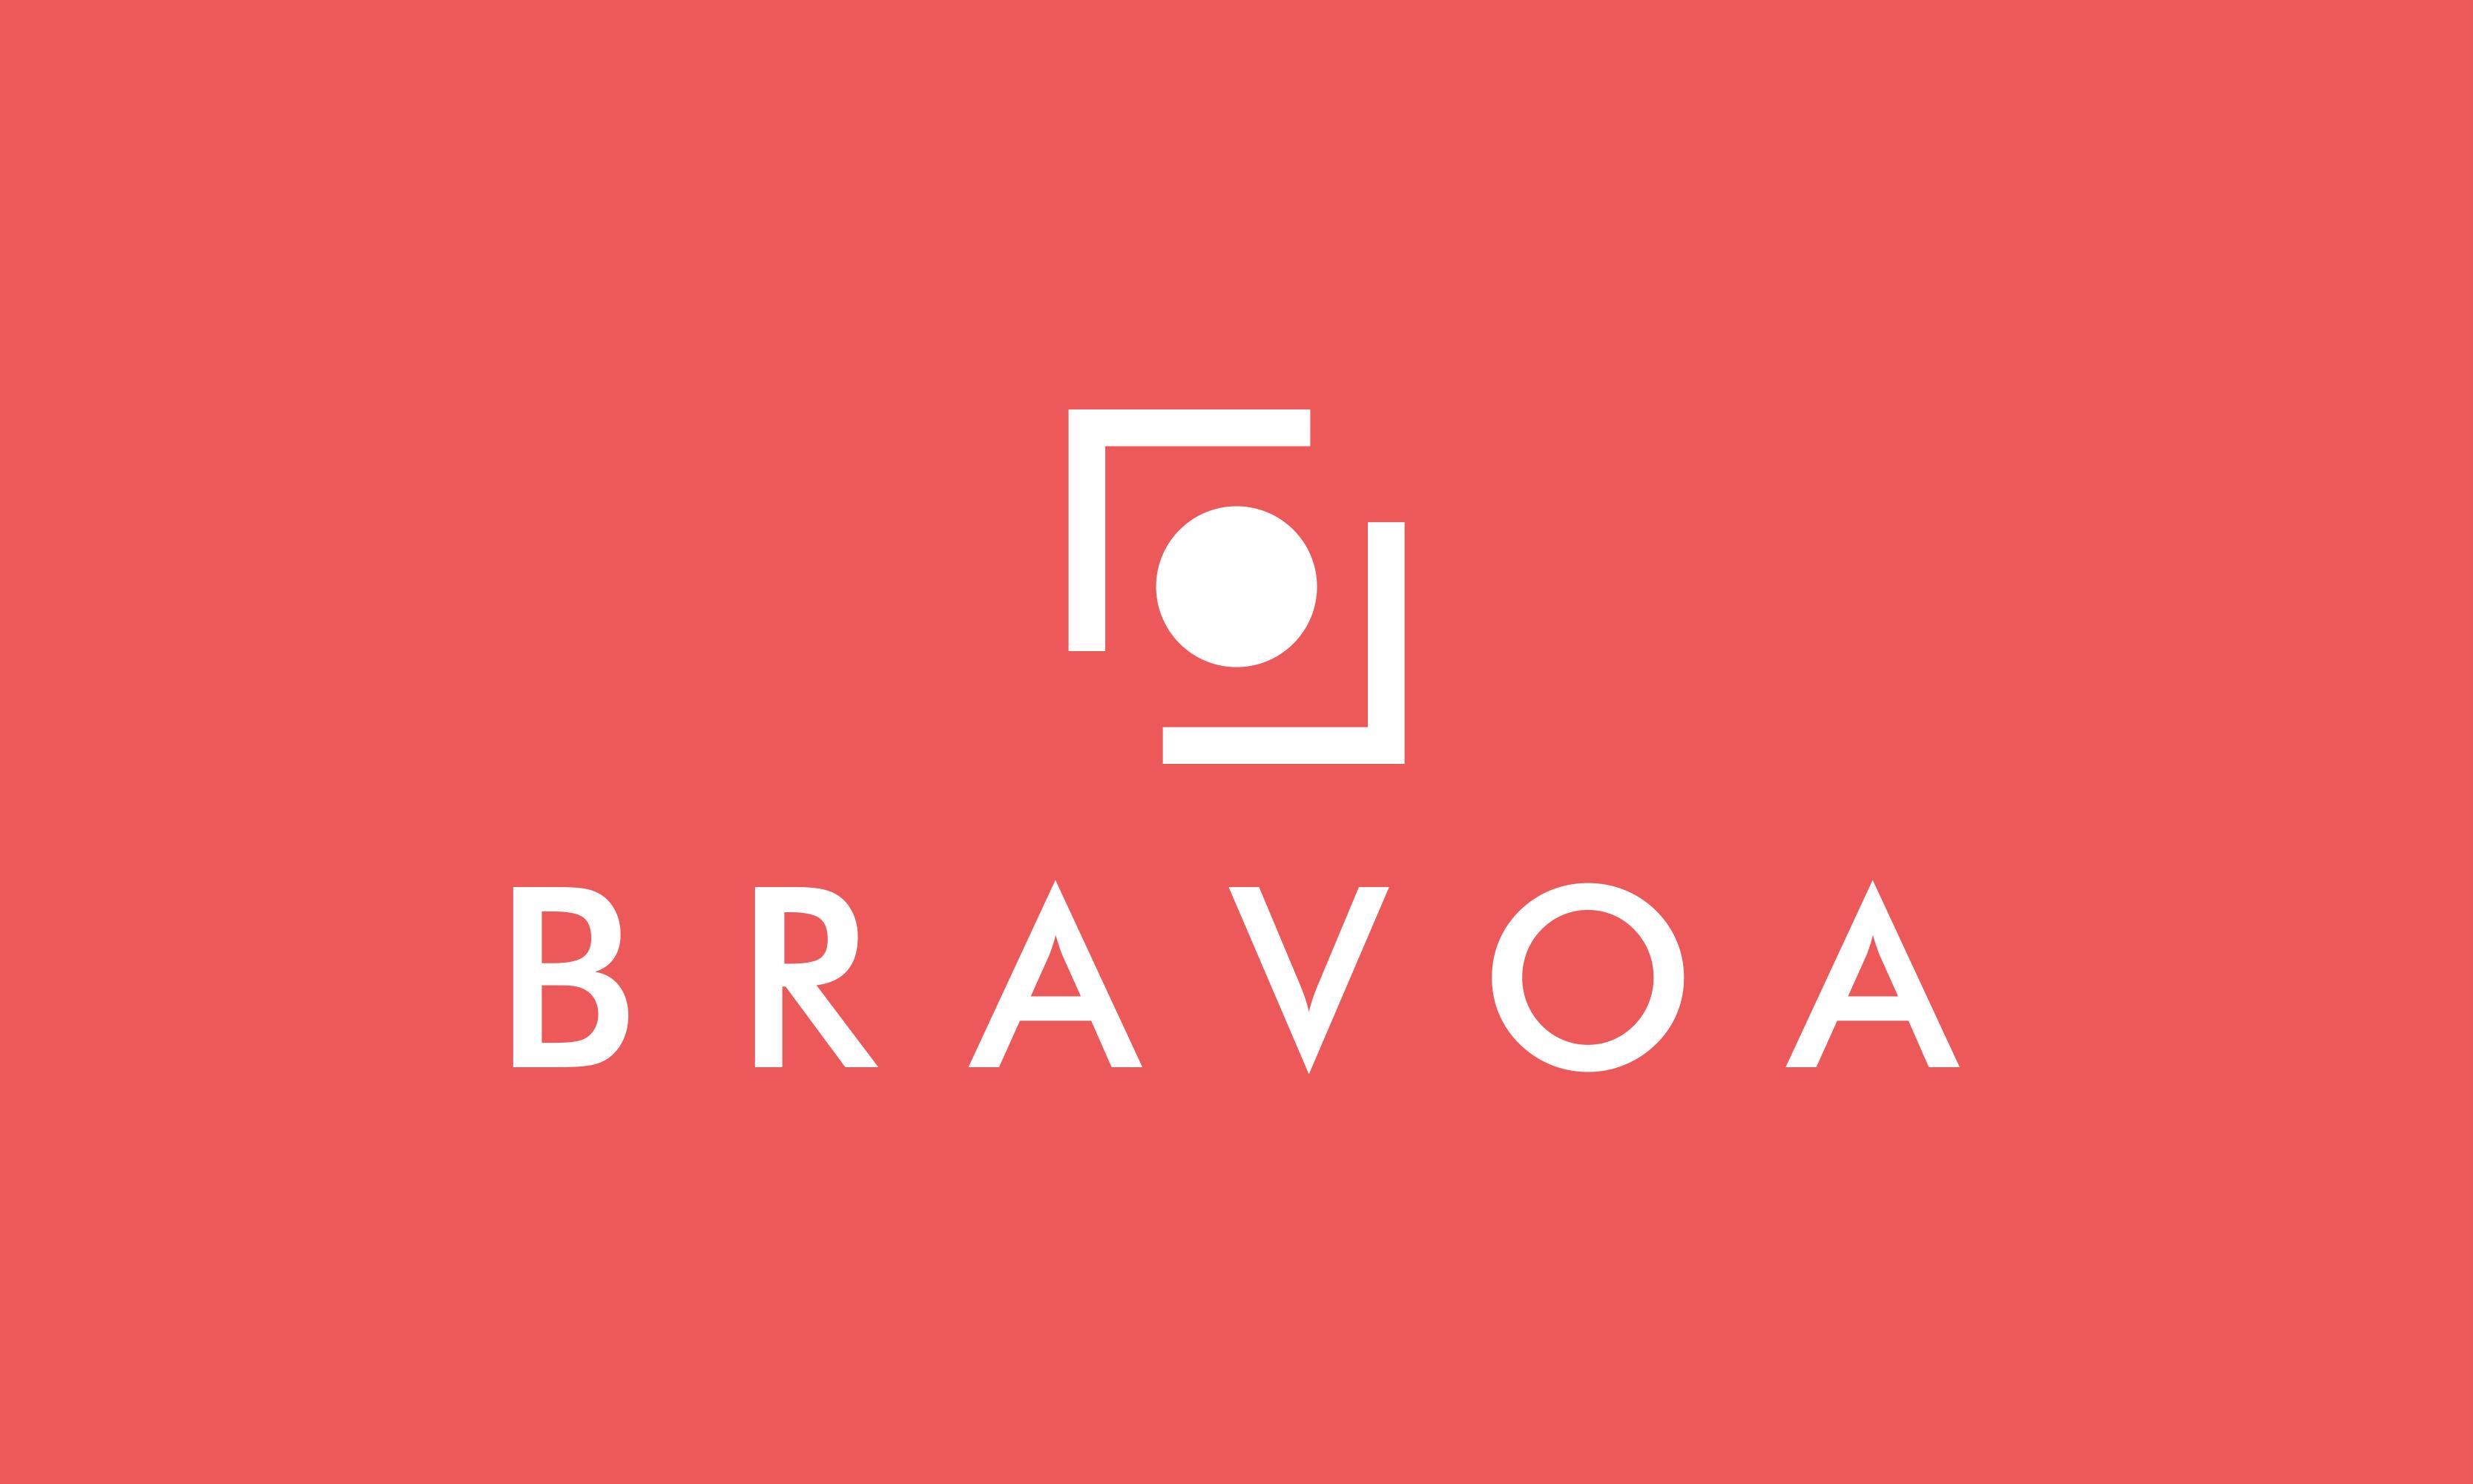 Bravoa